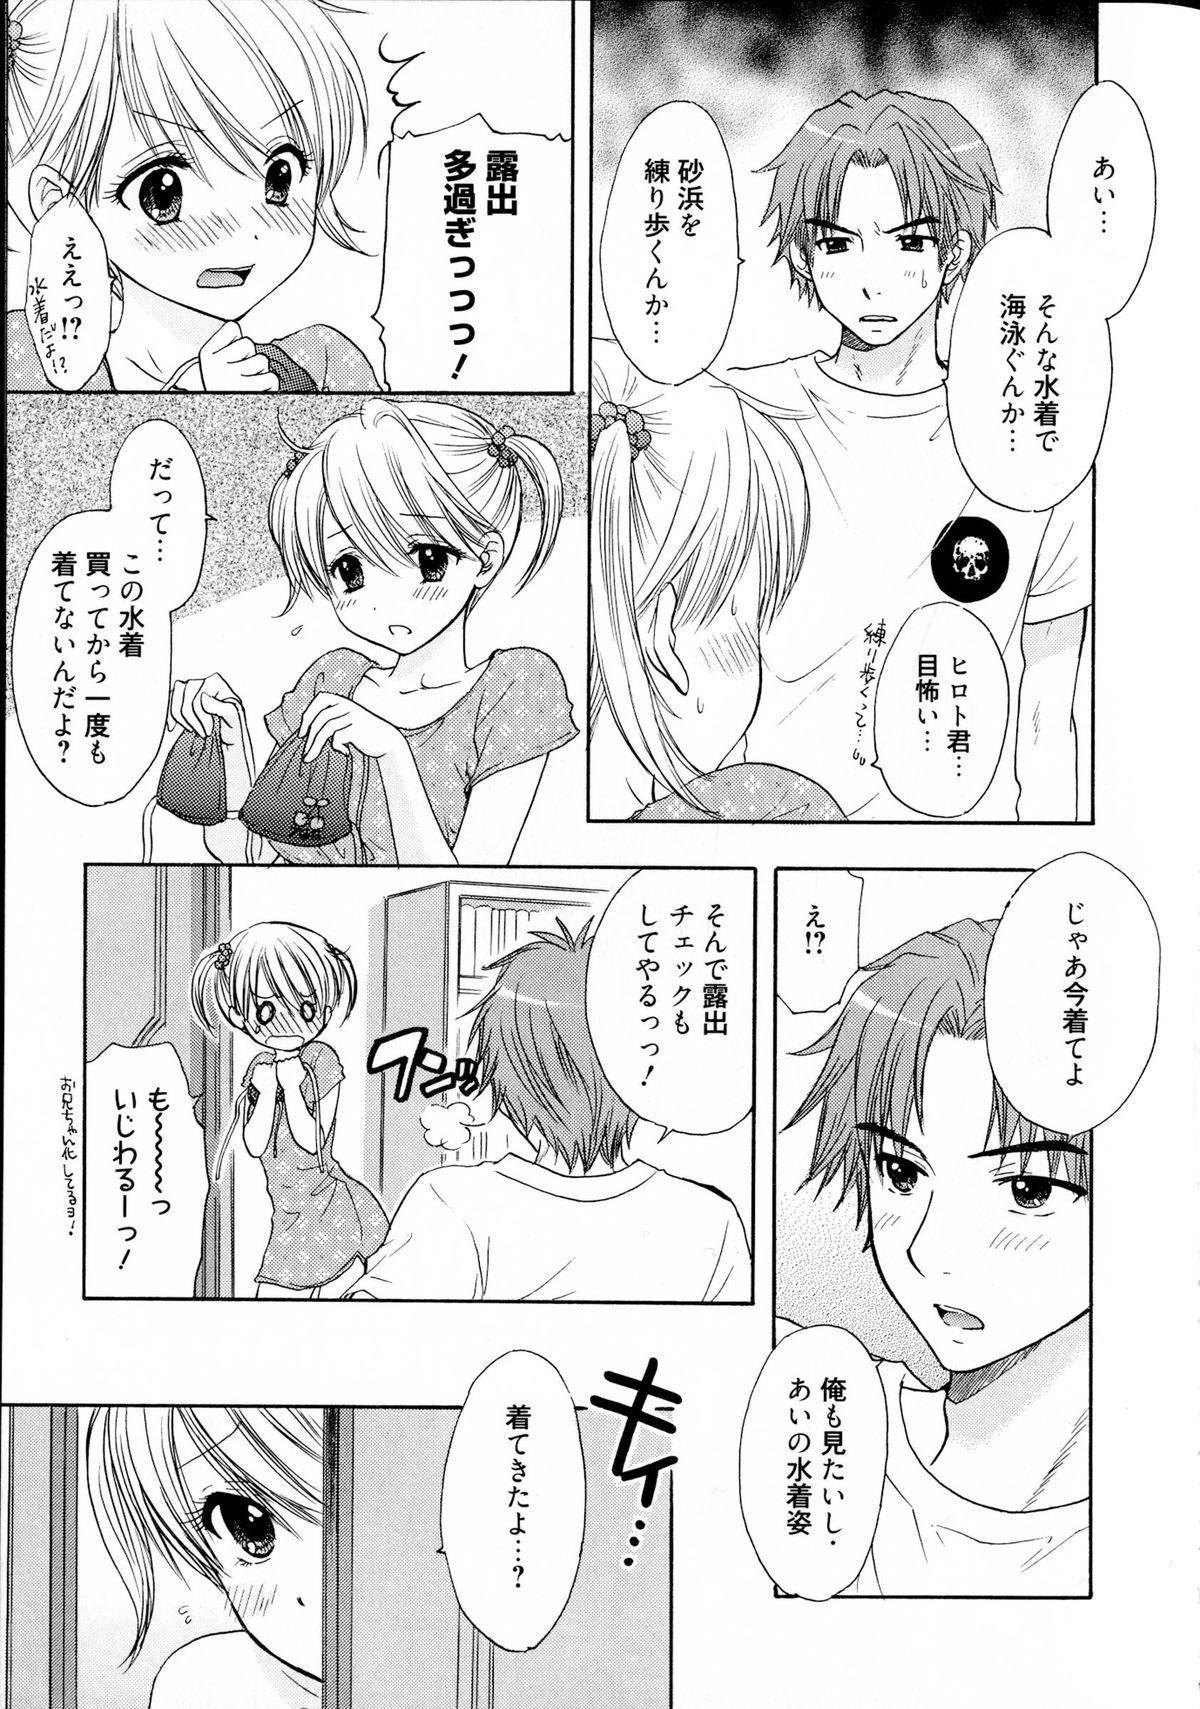 The Great Escape 4 Shokai Genteiban 122